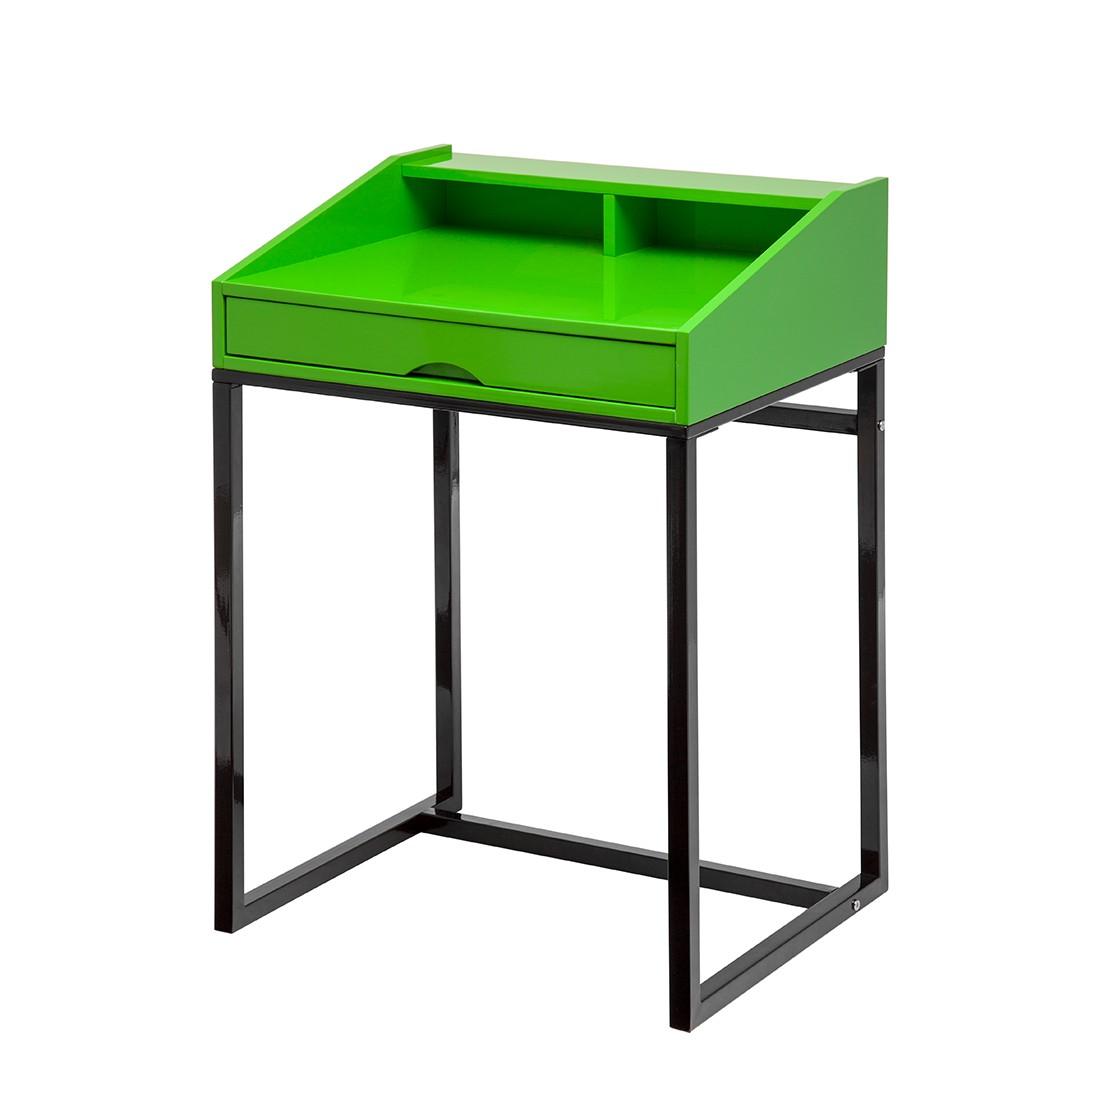 Peppy Sekretär - Hochglanz Grün lackiert